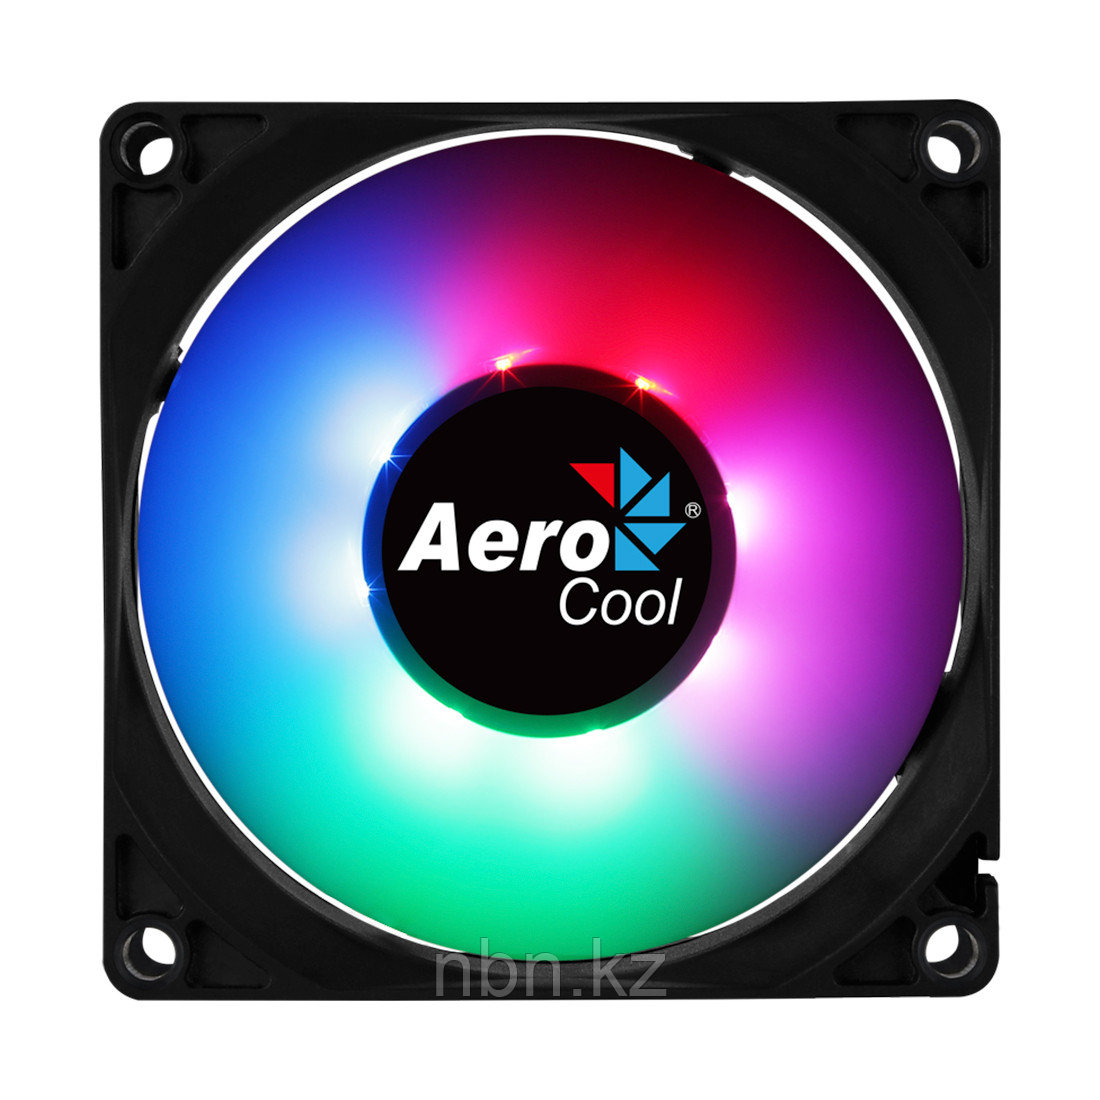 Кулер для компьютерного корпуса AeroCool Frost 8